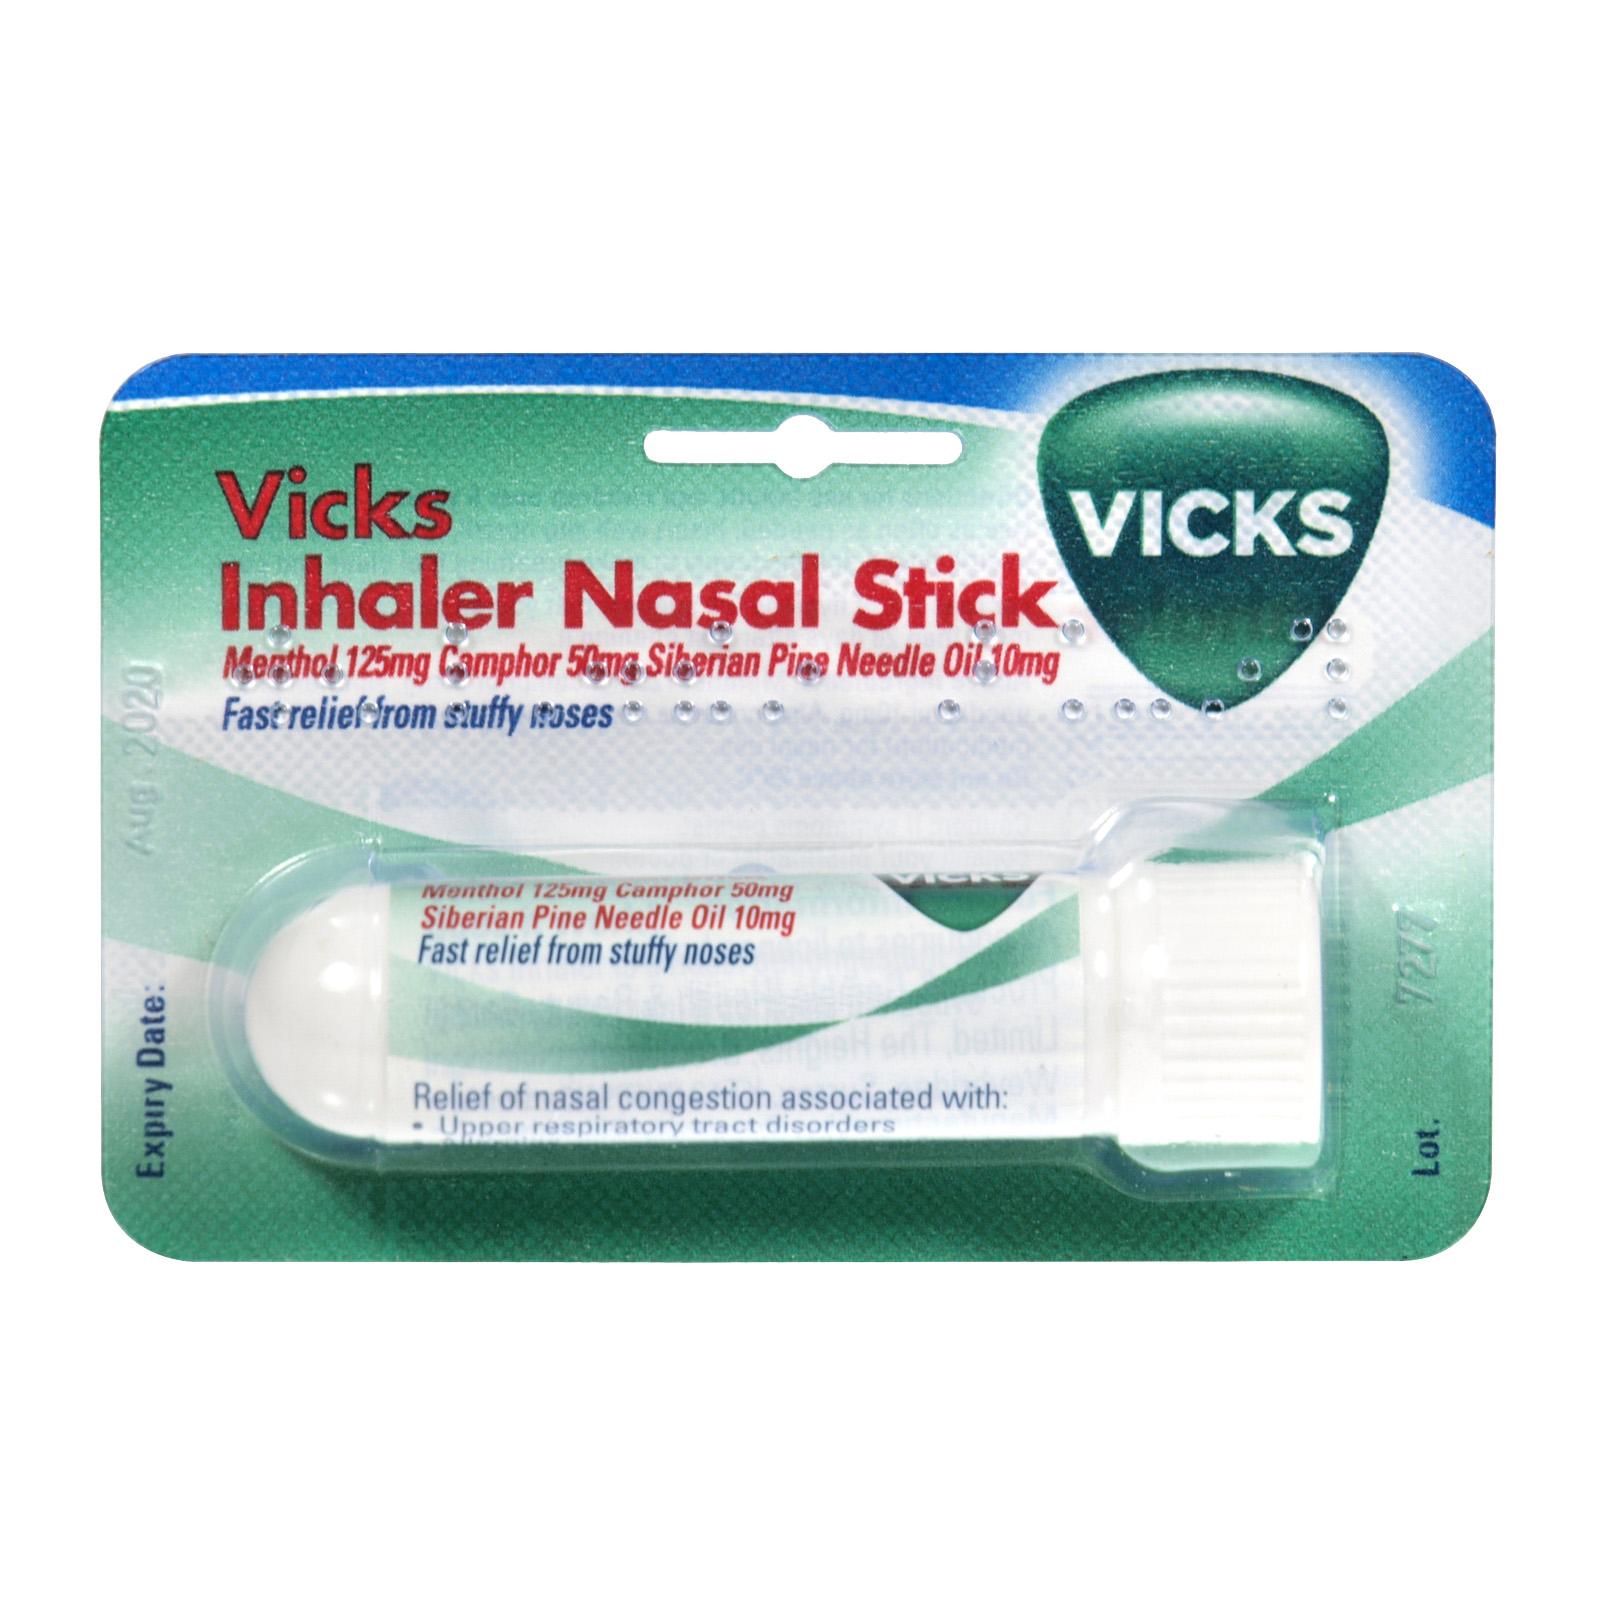 VICKS INHALER 0.5ML X12